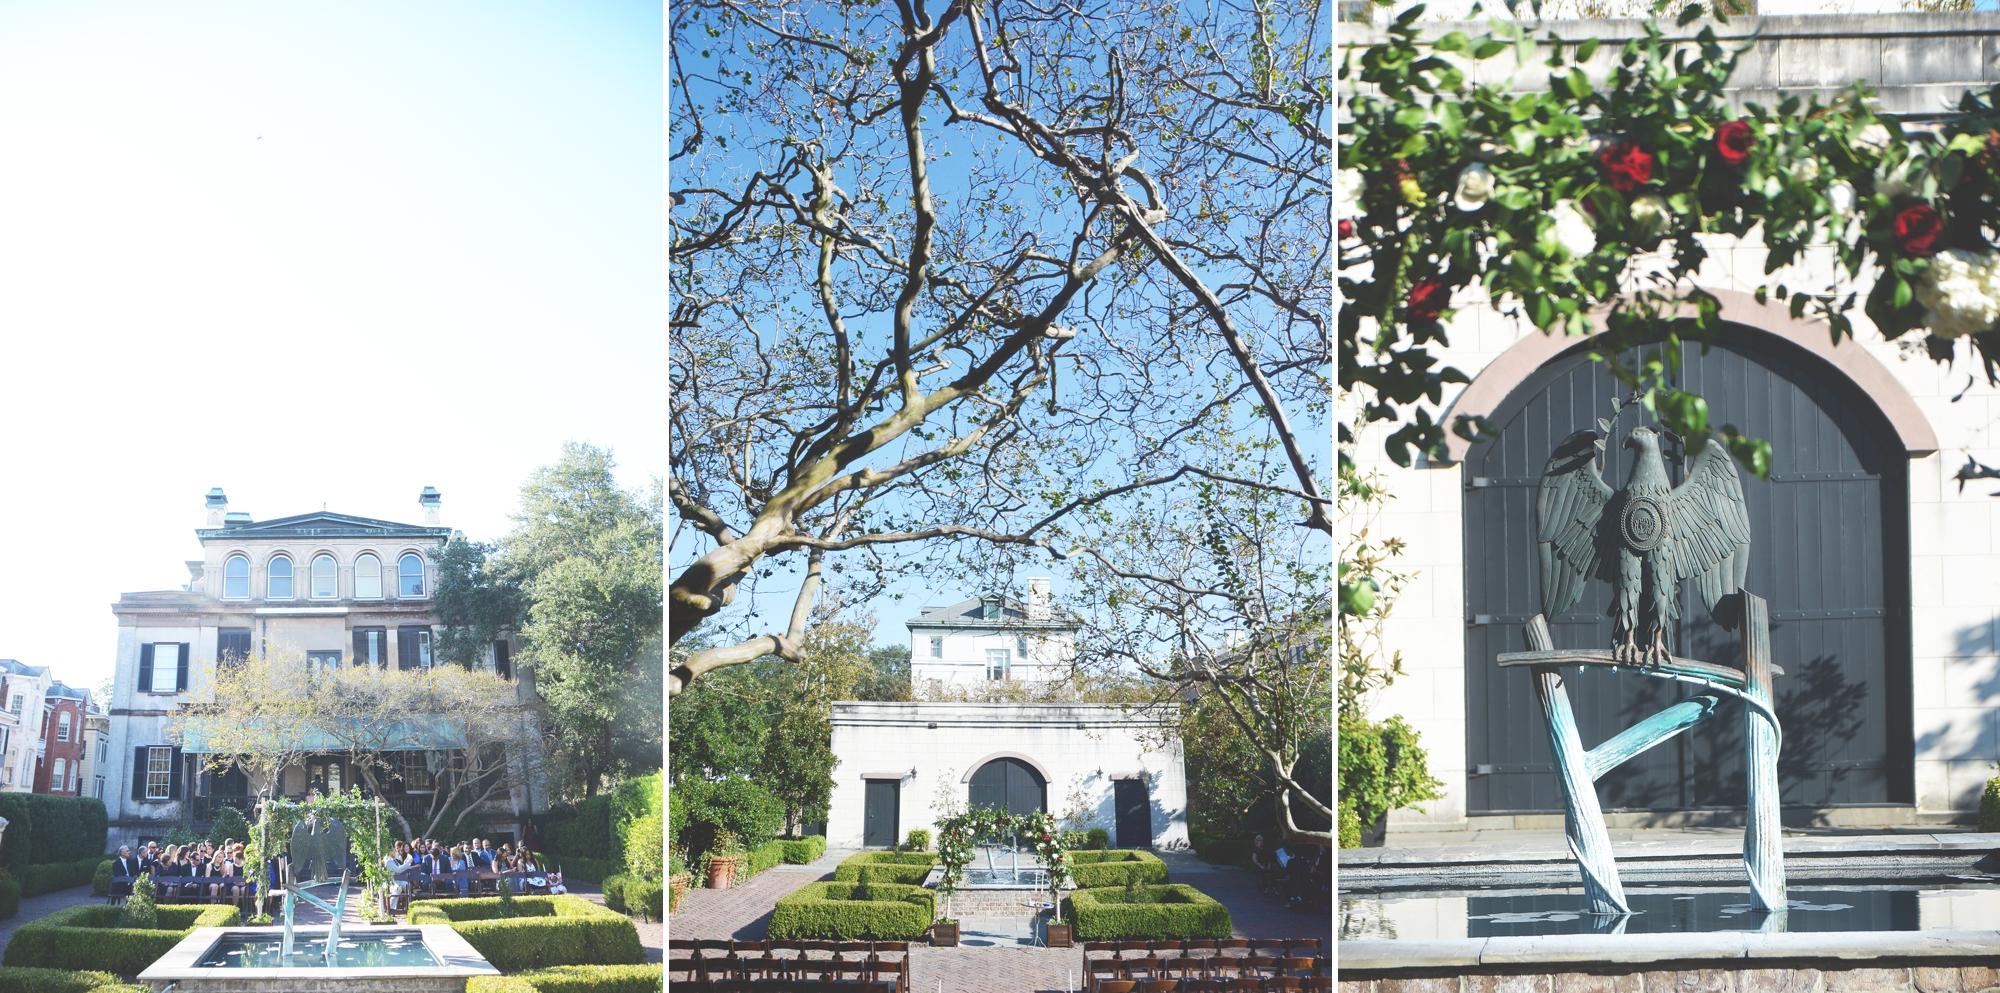 savannah-ga-harper-fowlkes-house-soho-south-cafe-wedding-six-hearts-photography031